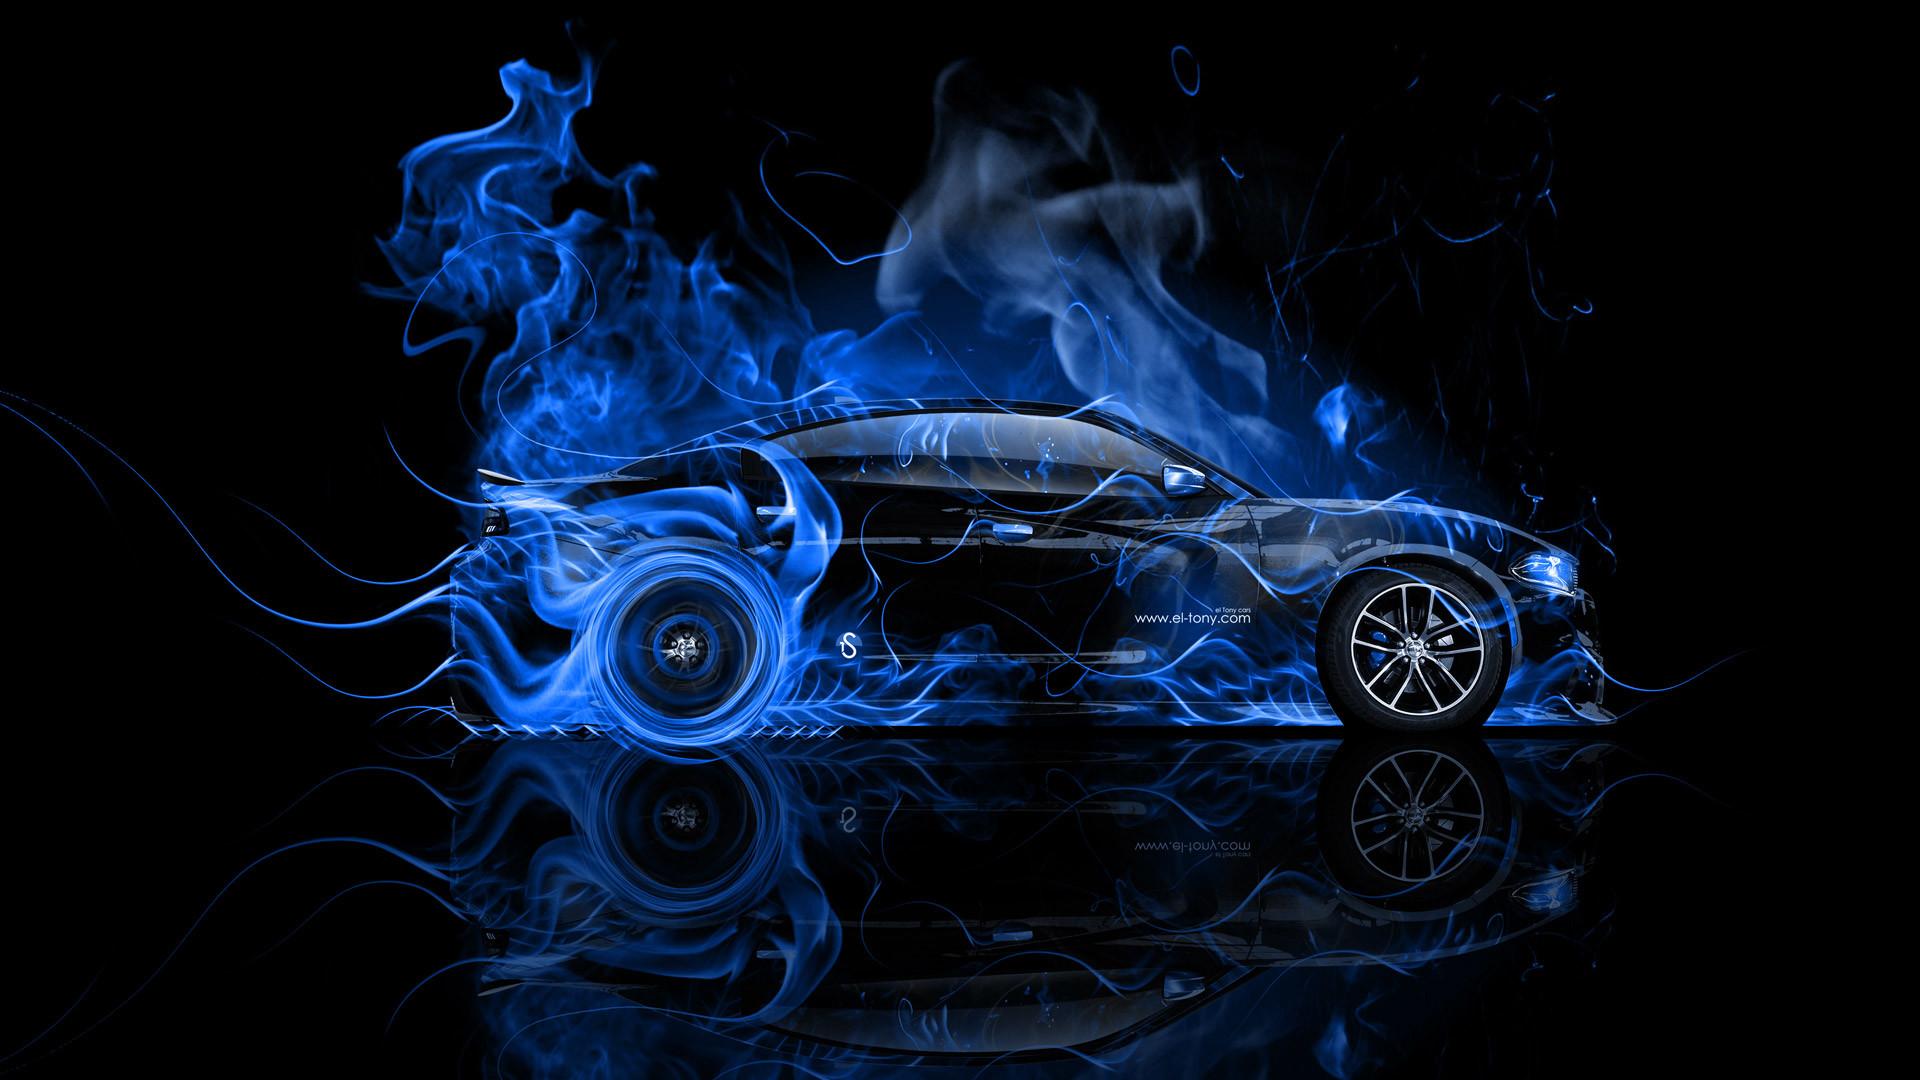 1920x1080 Hd Pics Photos Cars Blue Fire Abstract Desktop Background  Wallpaper